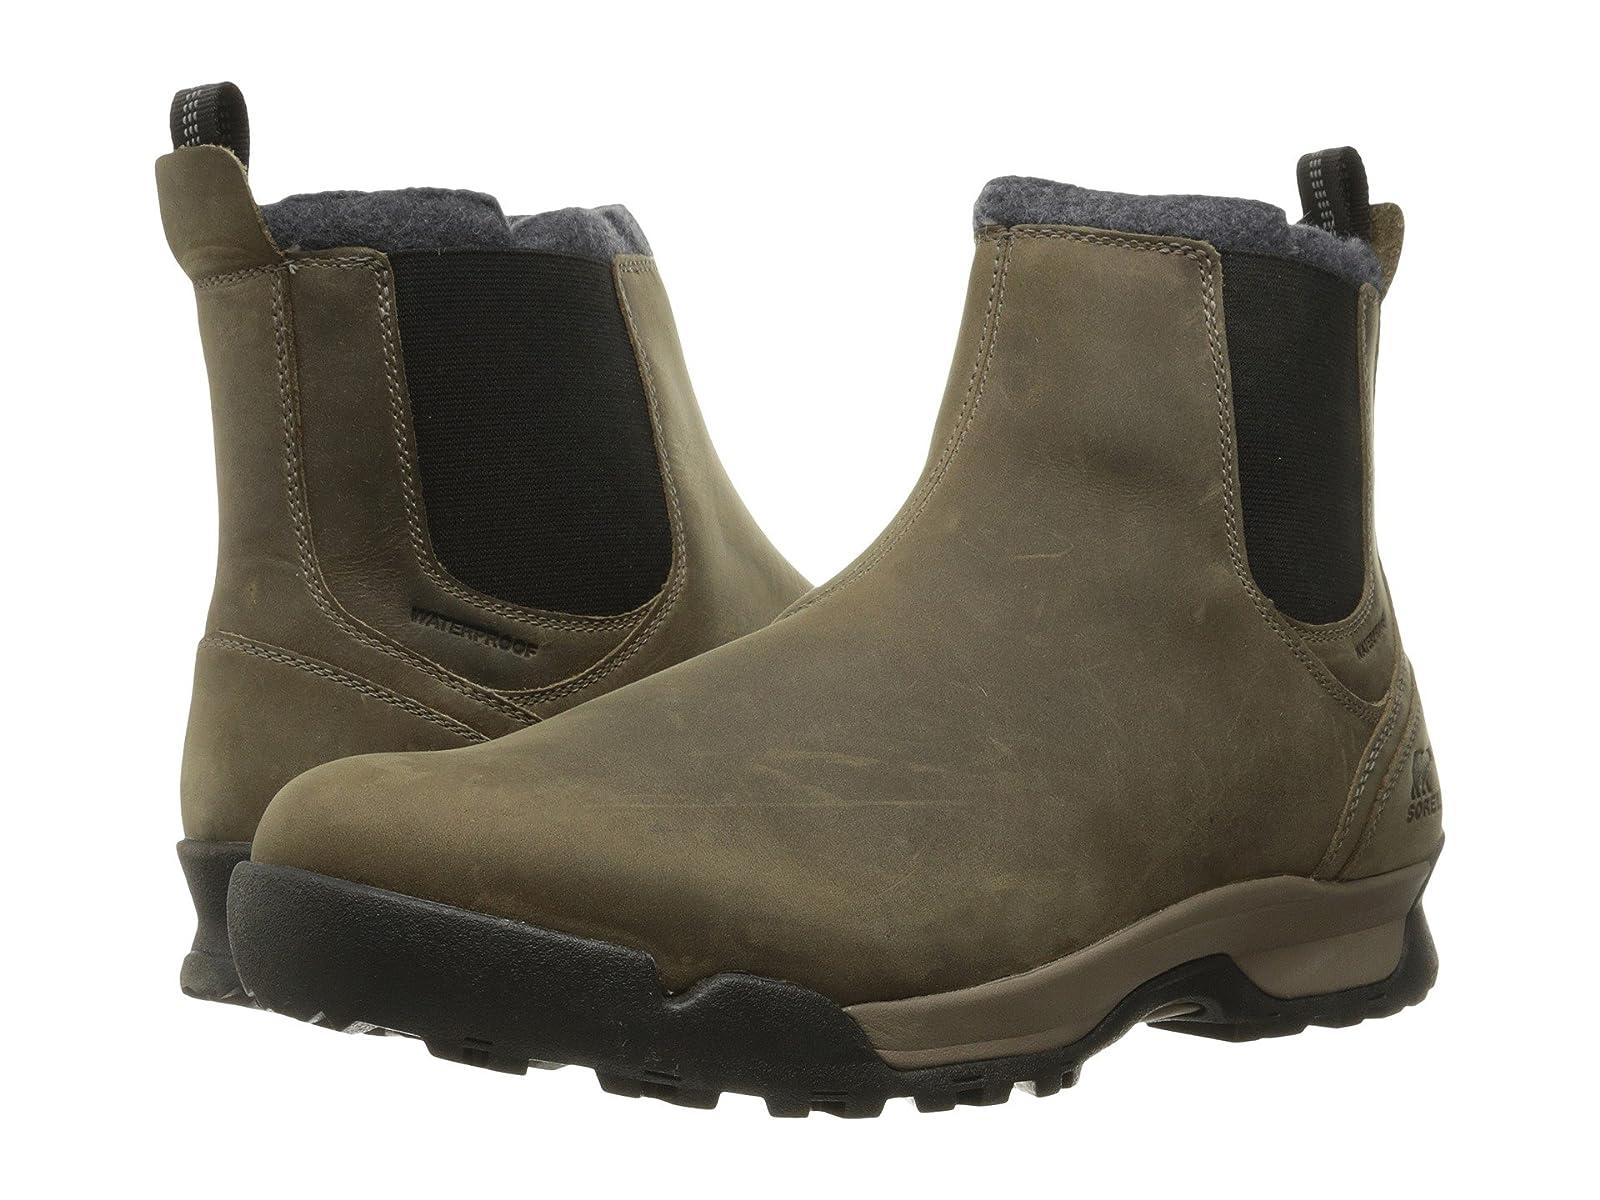 SOREL Paxson Chukka WaterproofEconomical and quality shoes